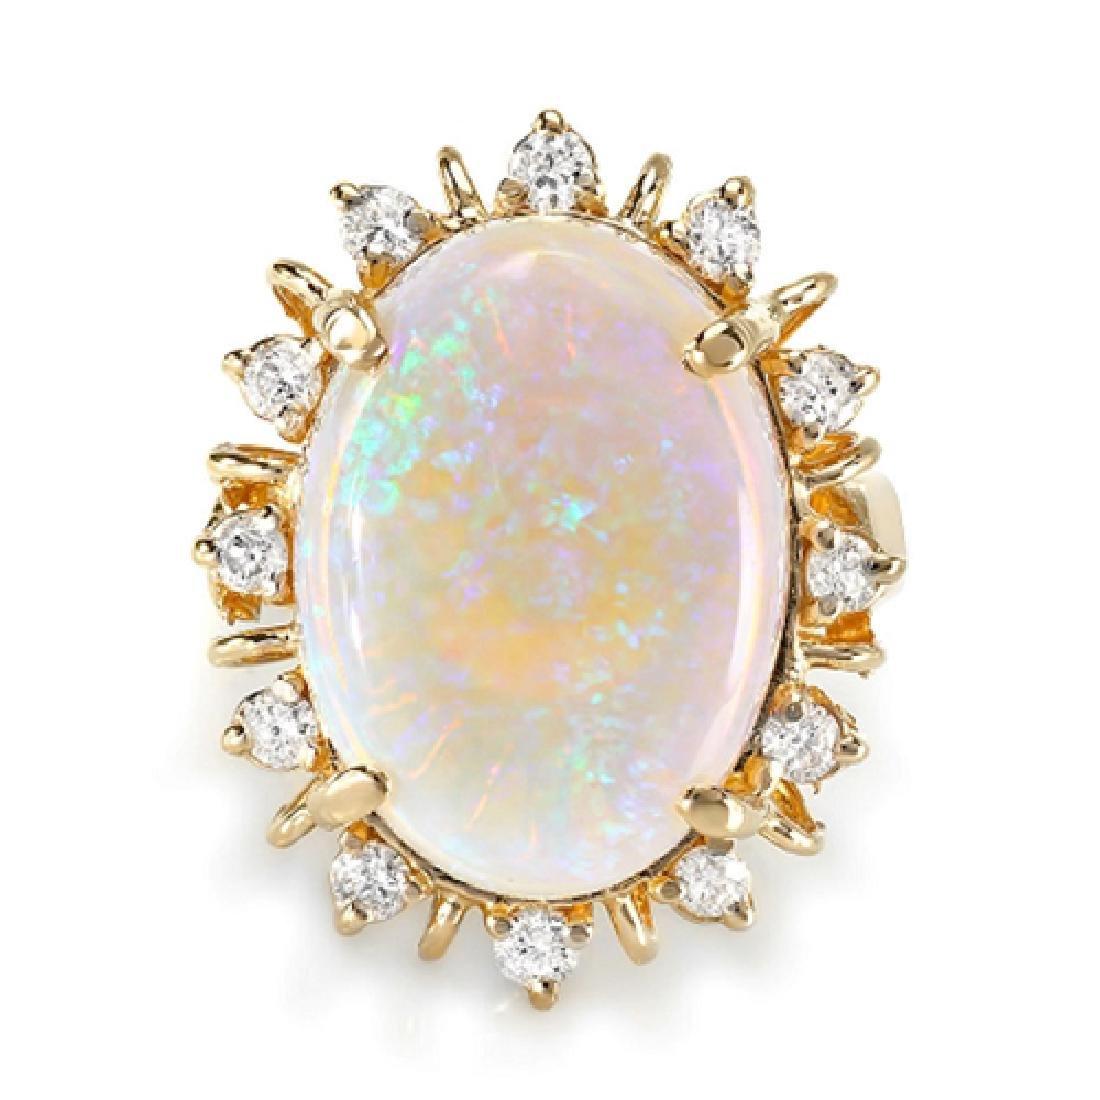 9.88 Carat Natural Opal 18K Solid Yellow Gold Diamond